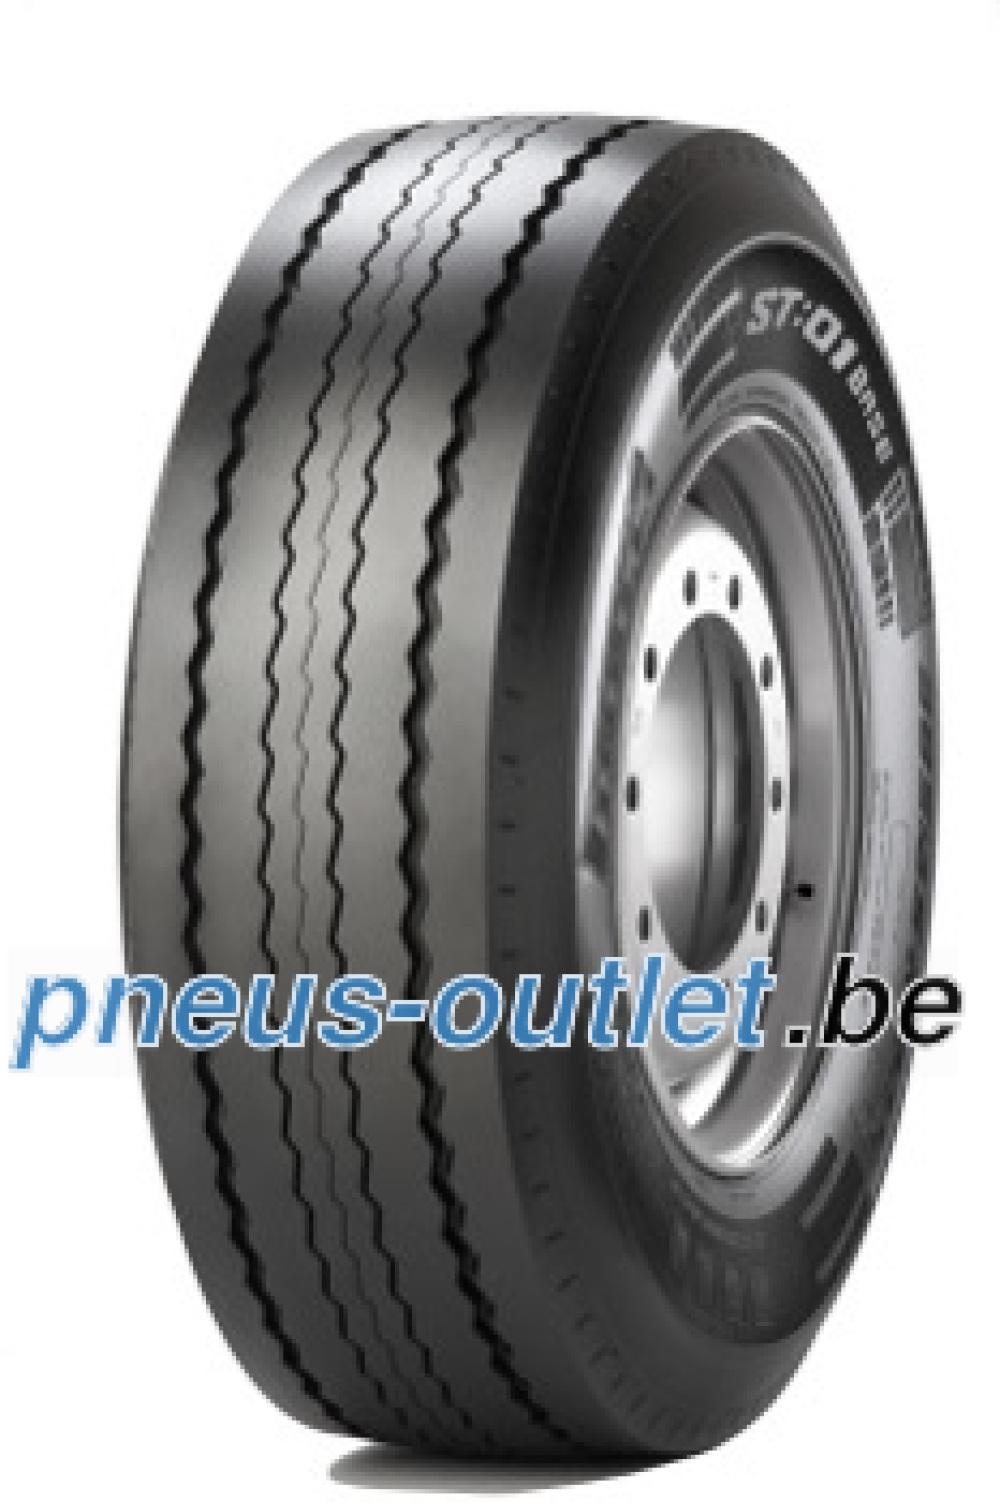 Pirelli ST01 BASE ( 385/55 R22.5 160K )